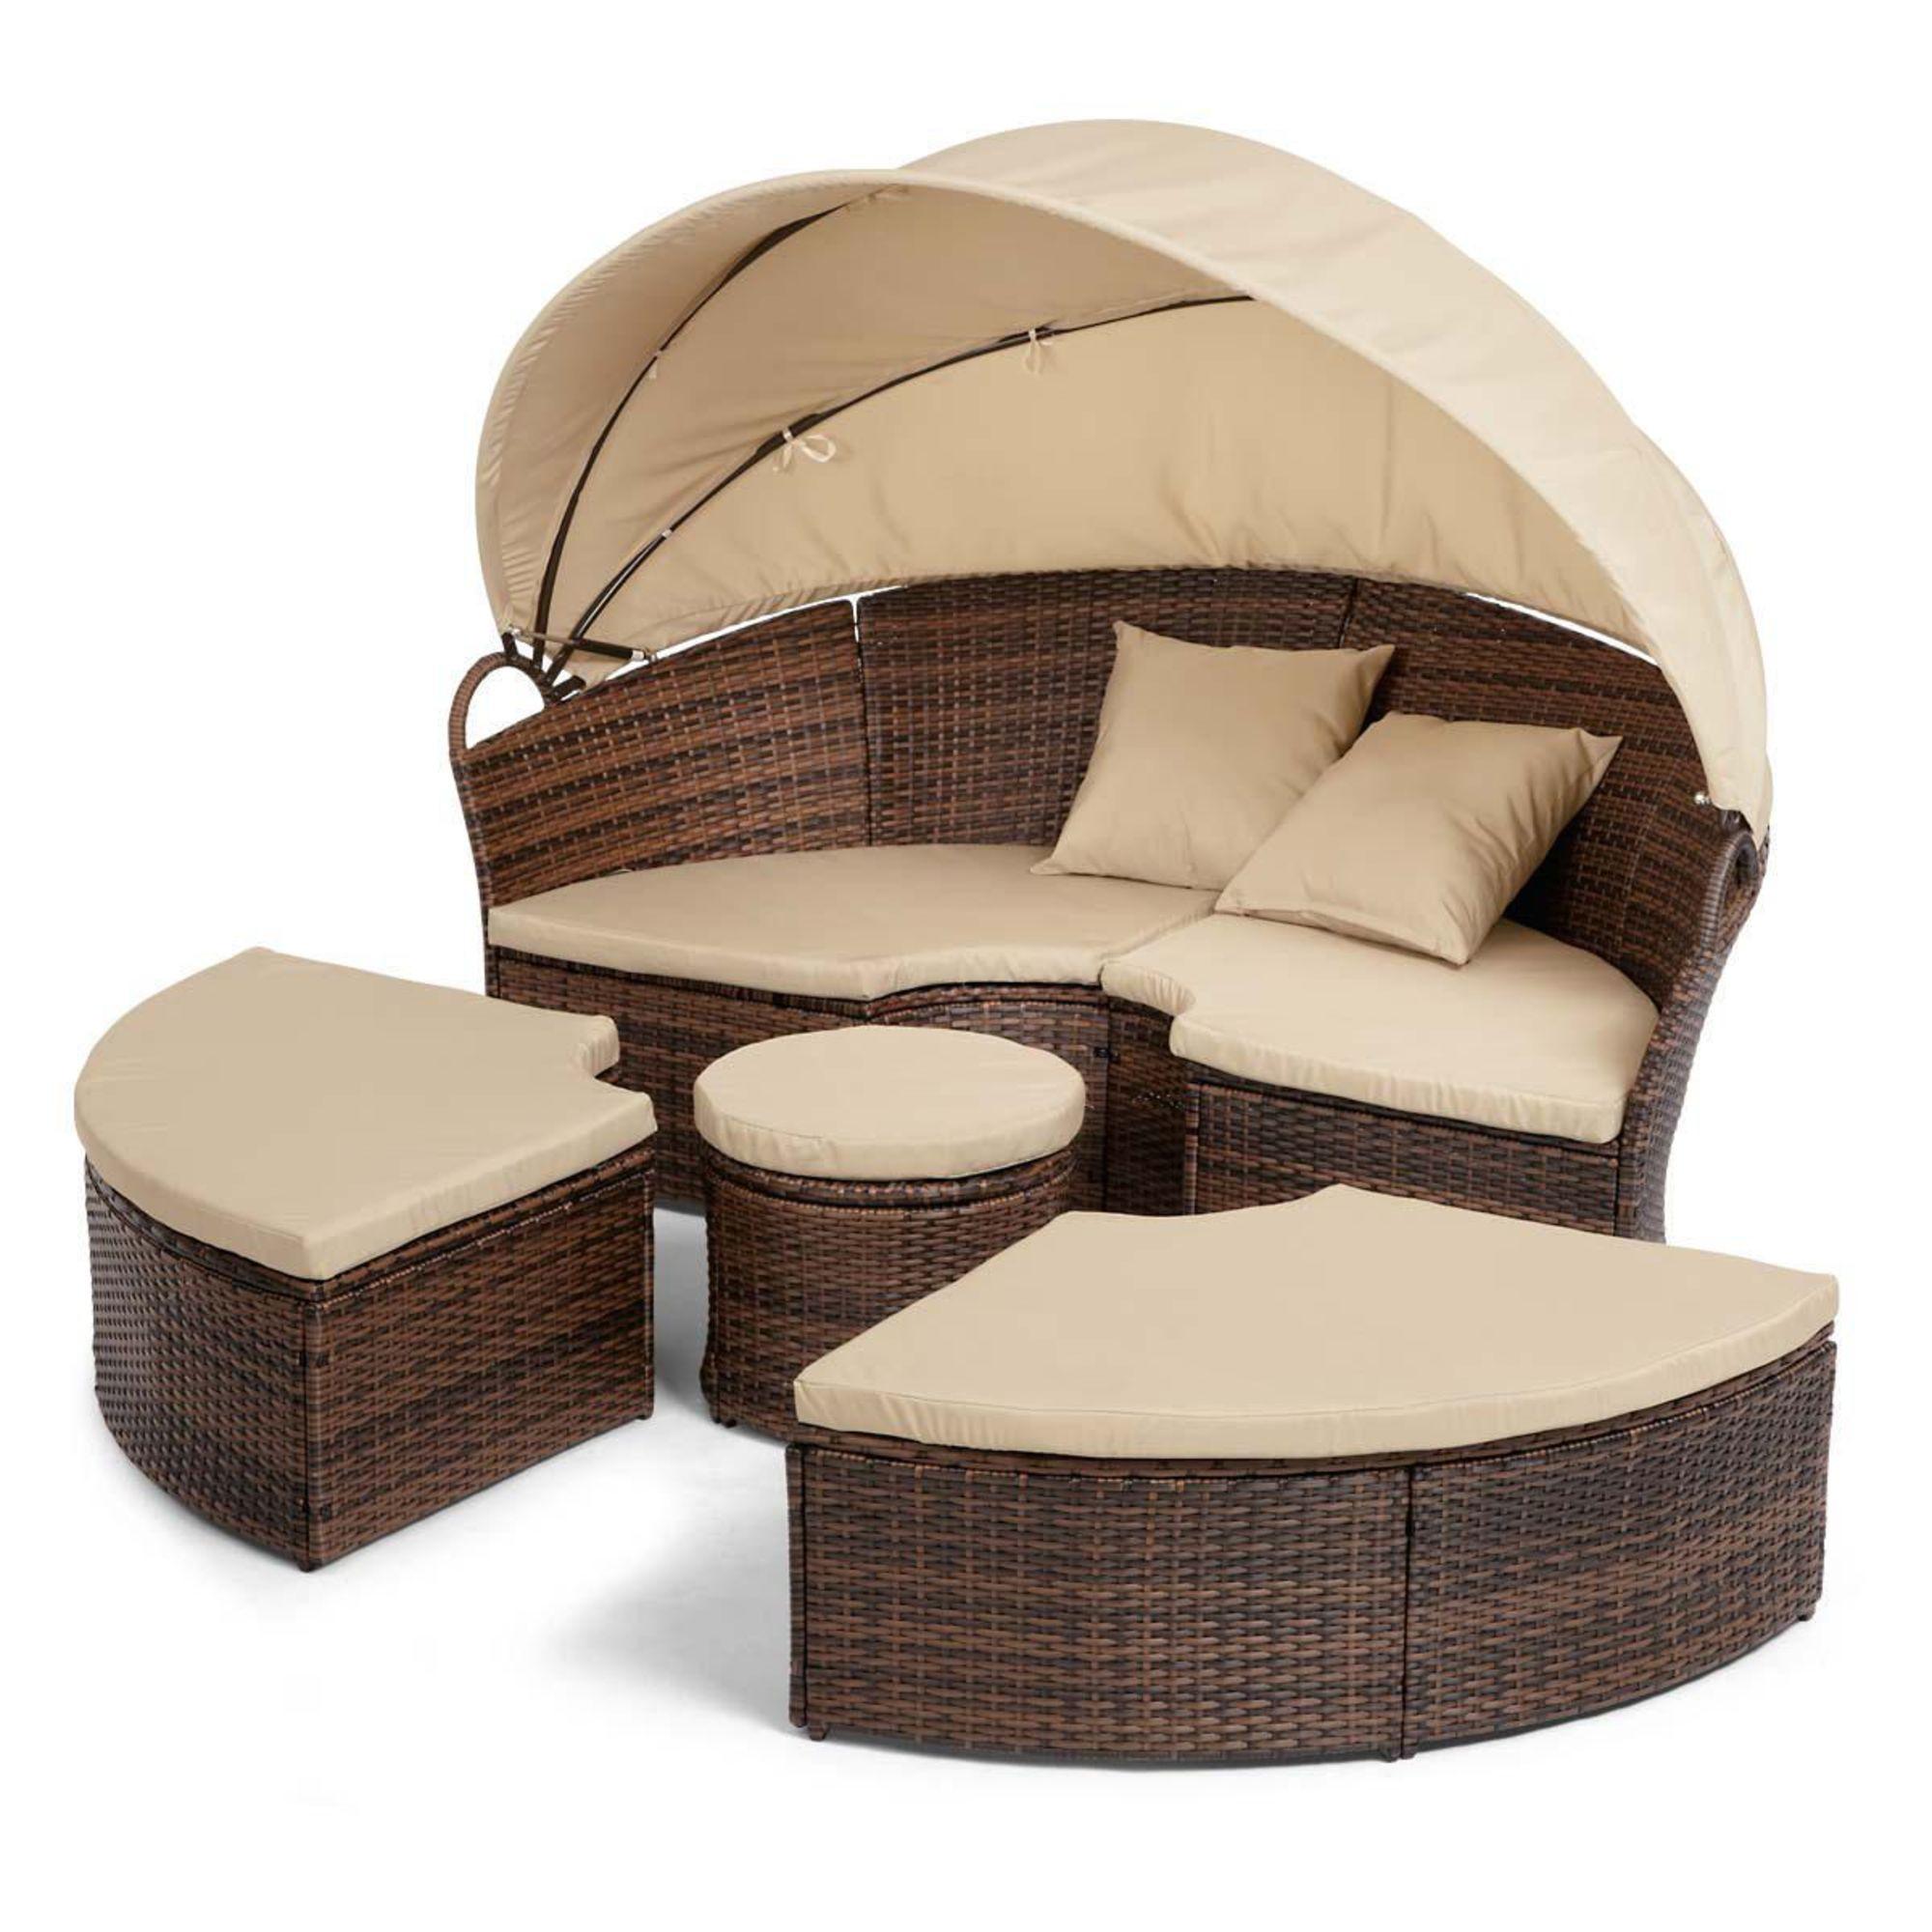 gartenmobel sonneninsel beste bildideen zu hause design. Black Bedroom Furniture Sets. Home Design Ideas